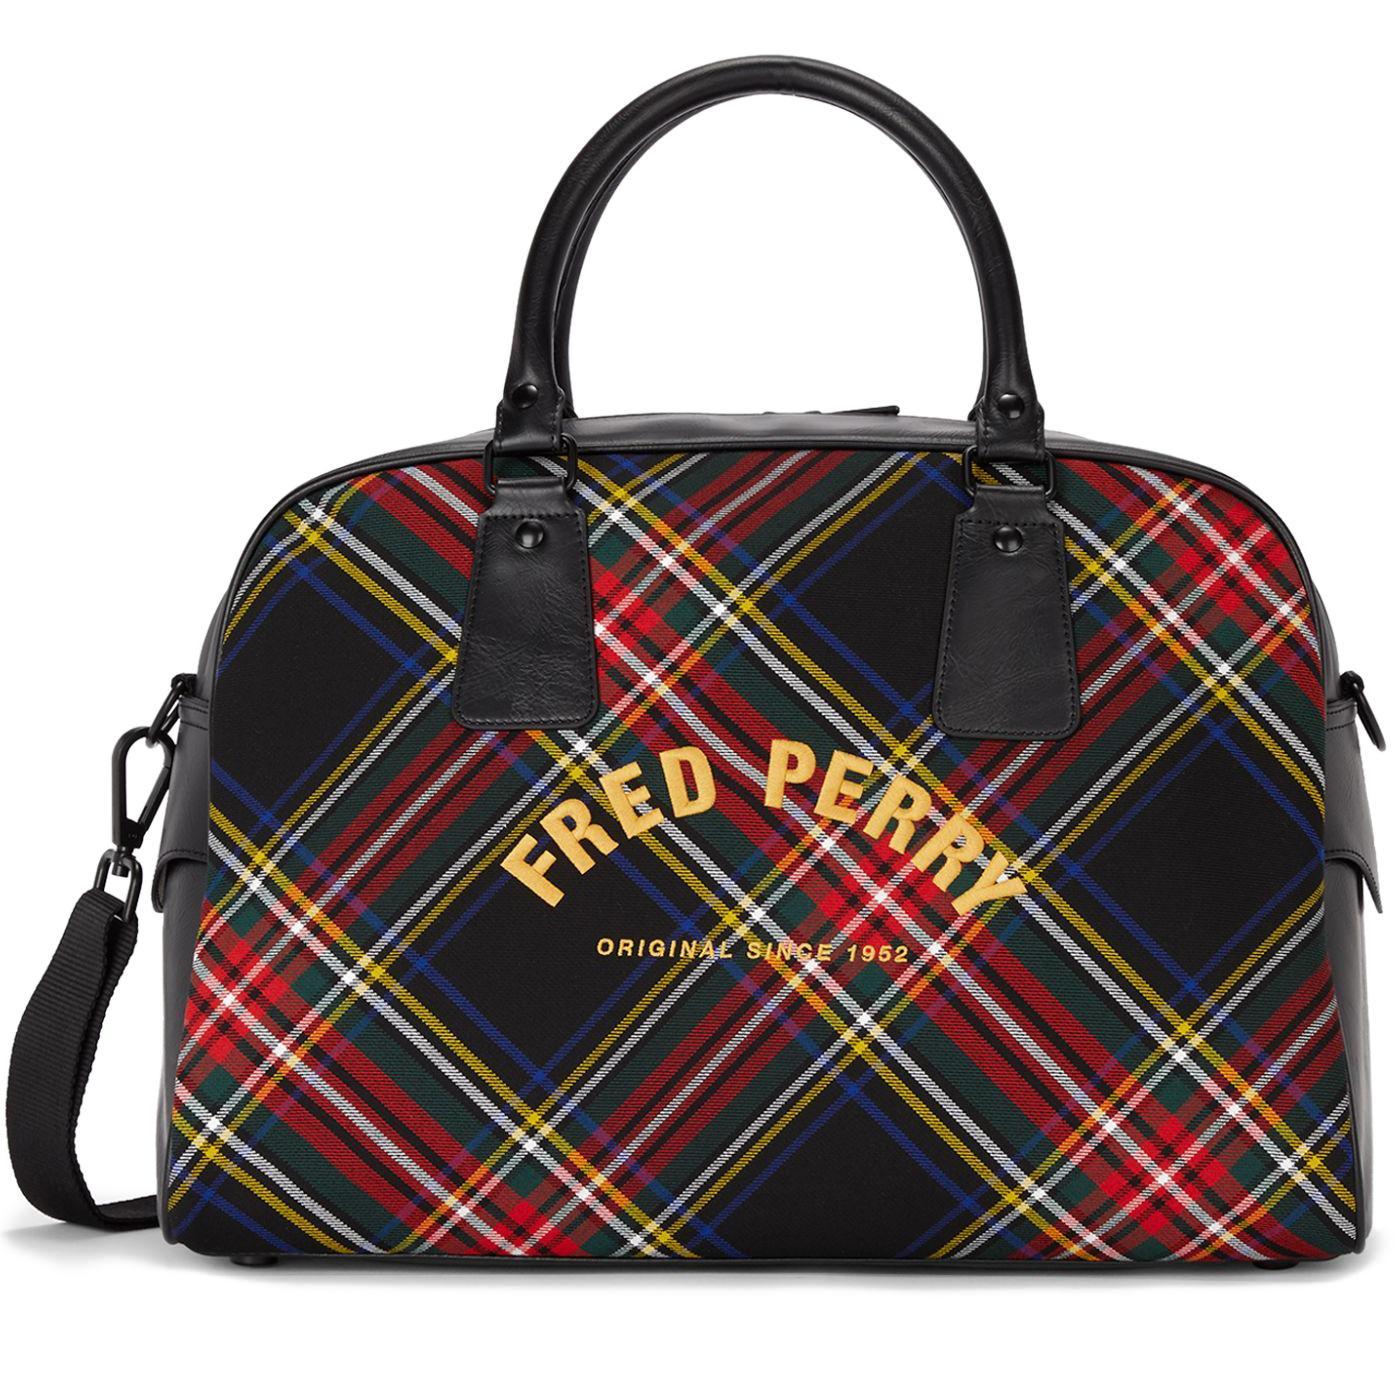 FRED PERRY Retro Mod Tartan Bowling Bag (Black)